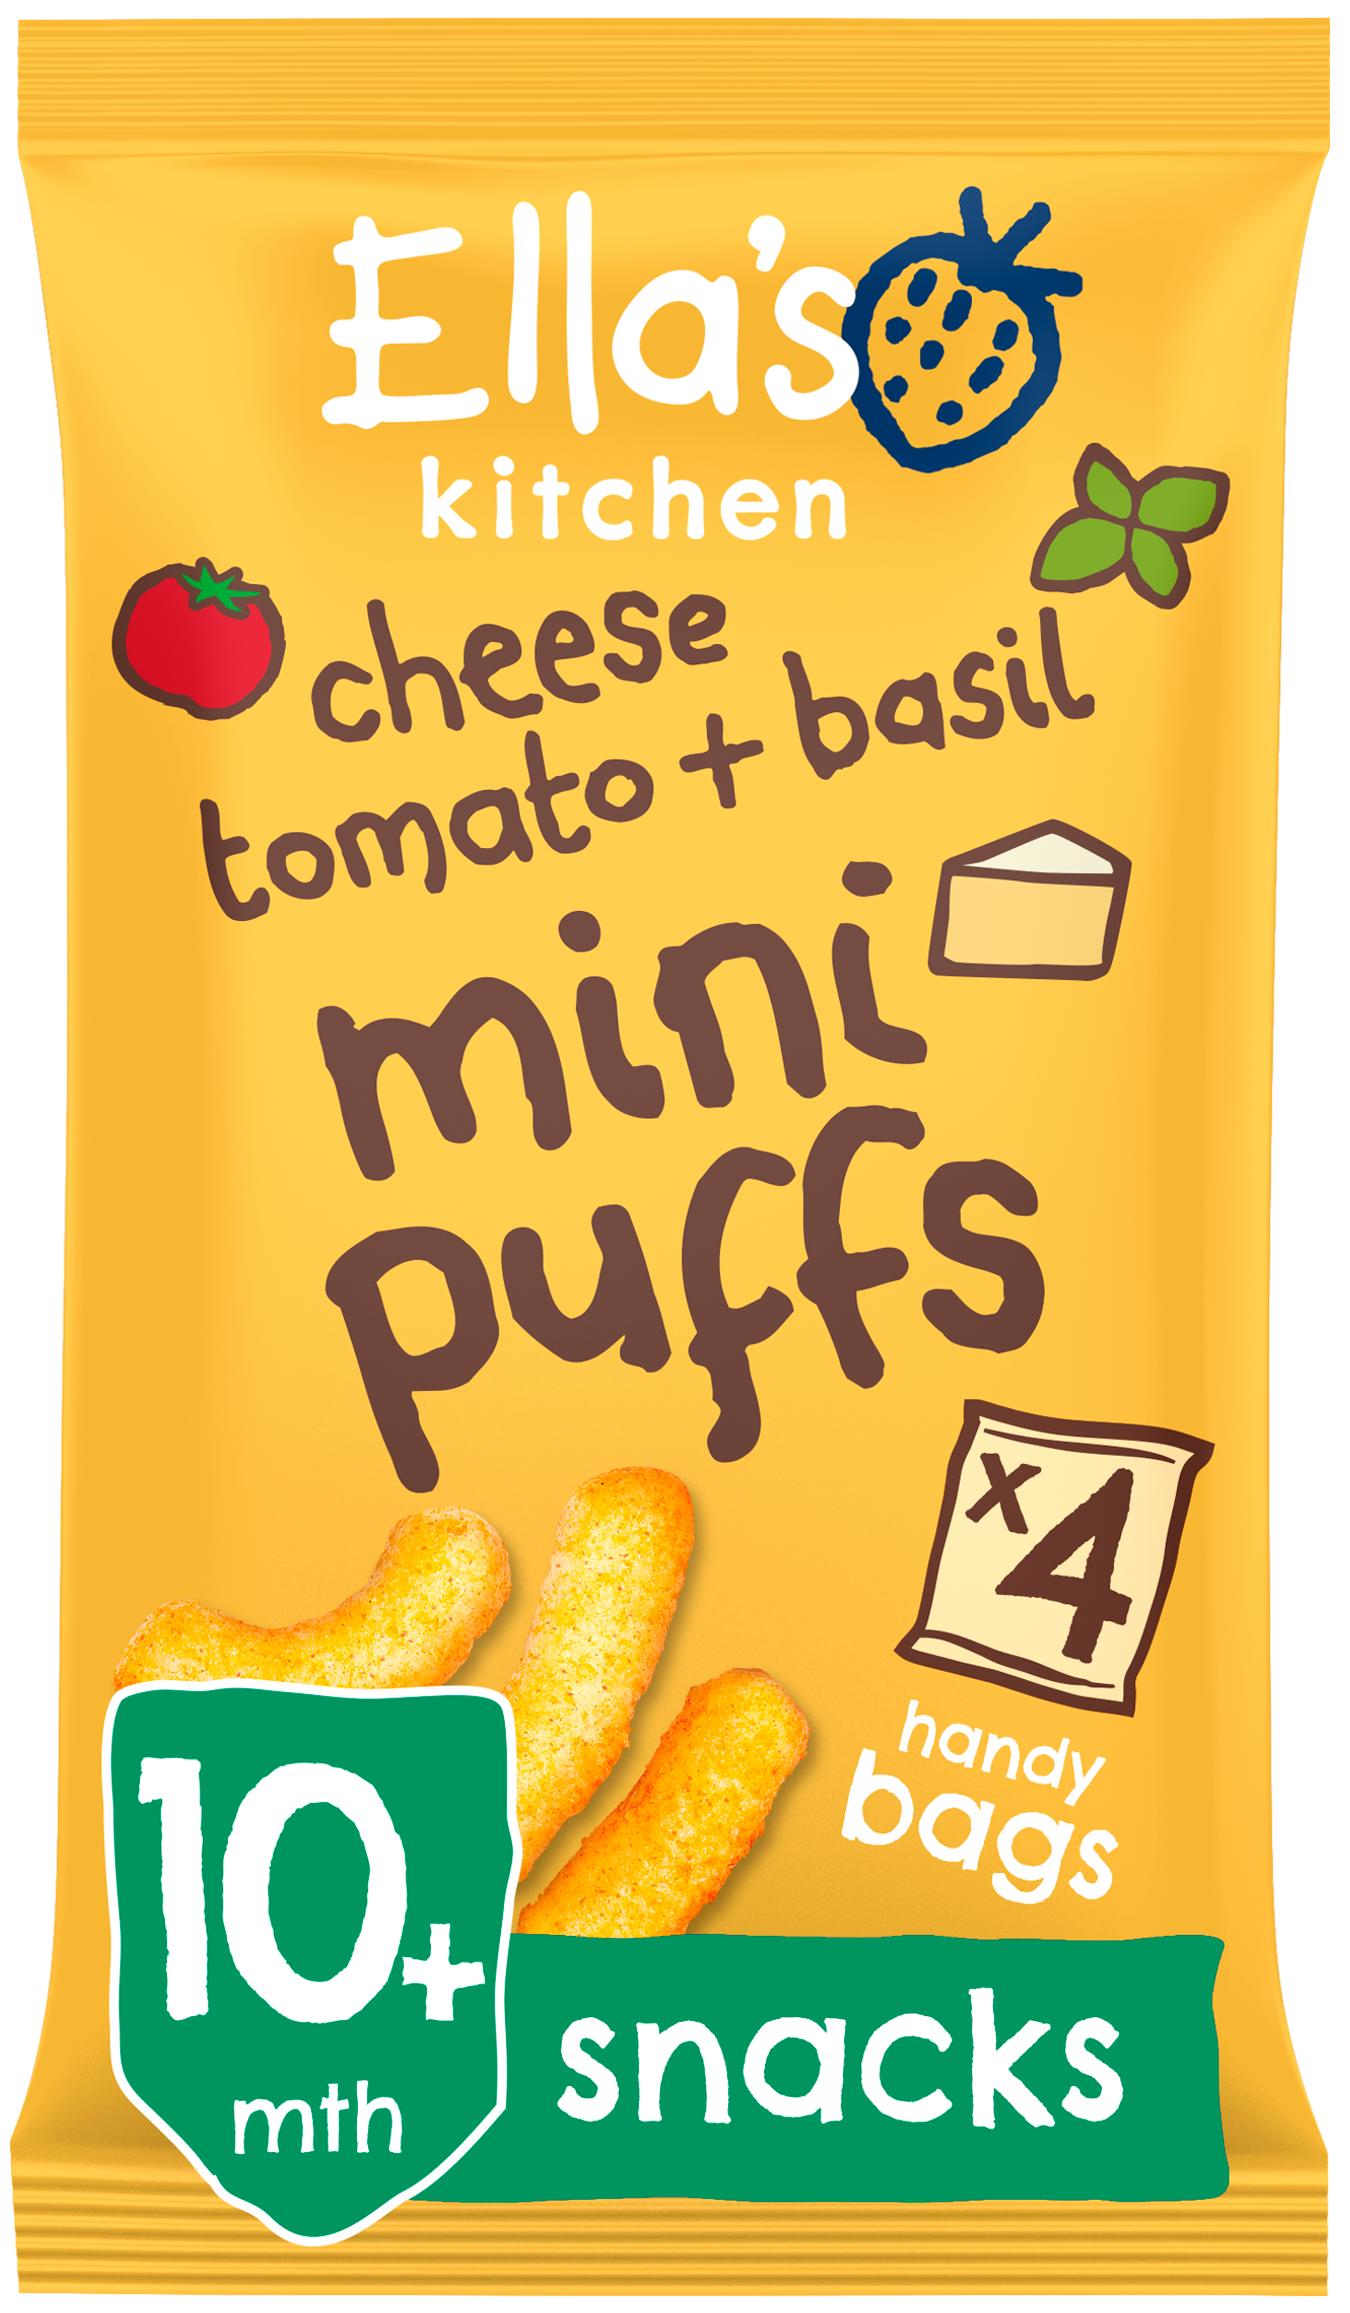 Ellas kitchen mini puffs cheese tomato basil bag front of pack O